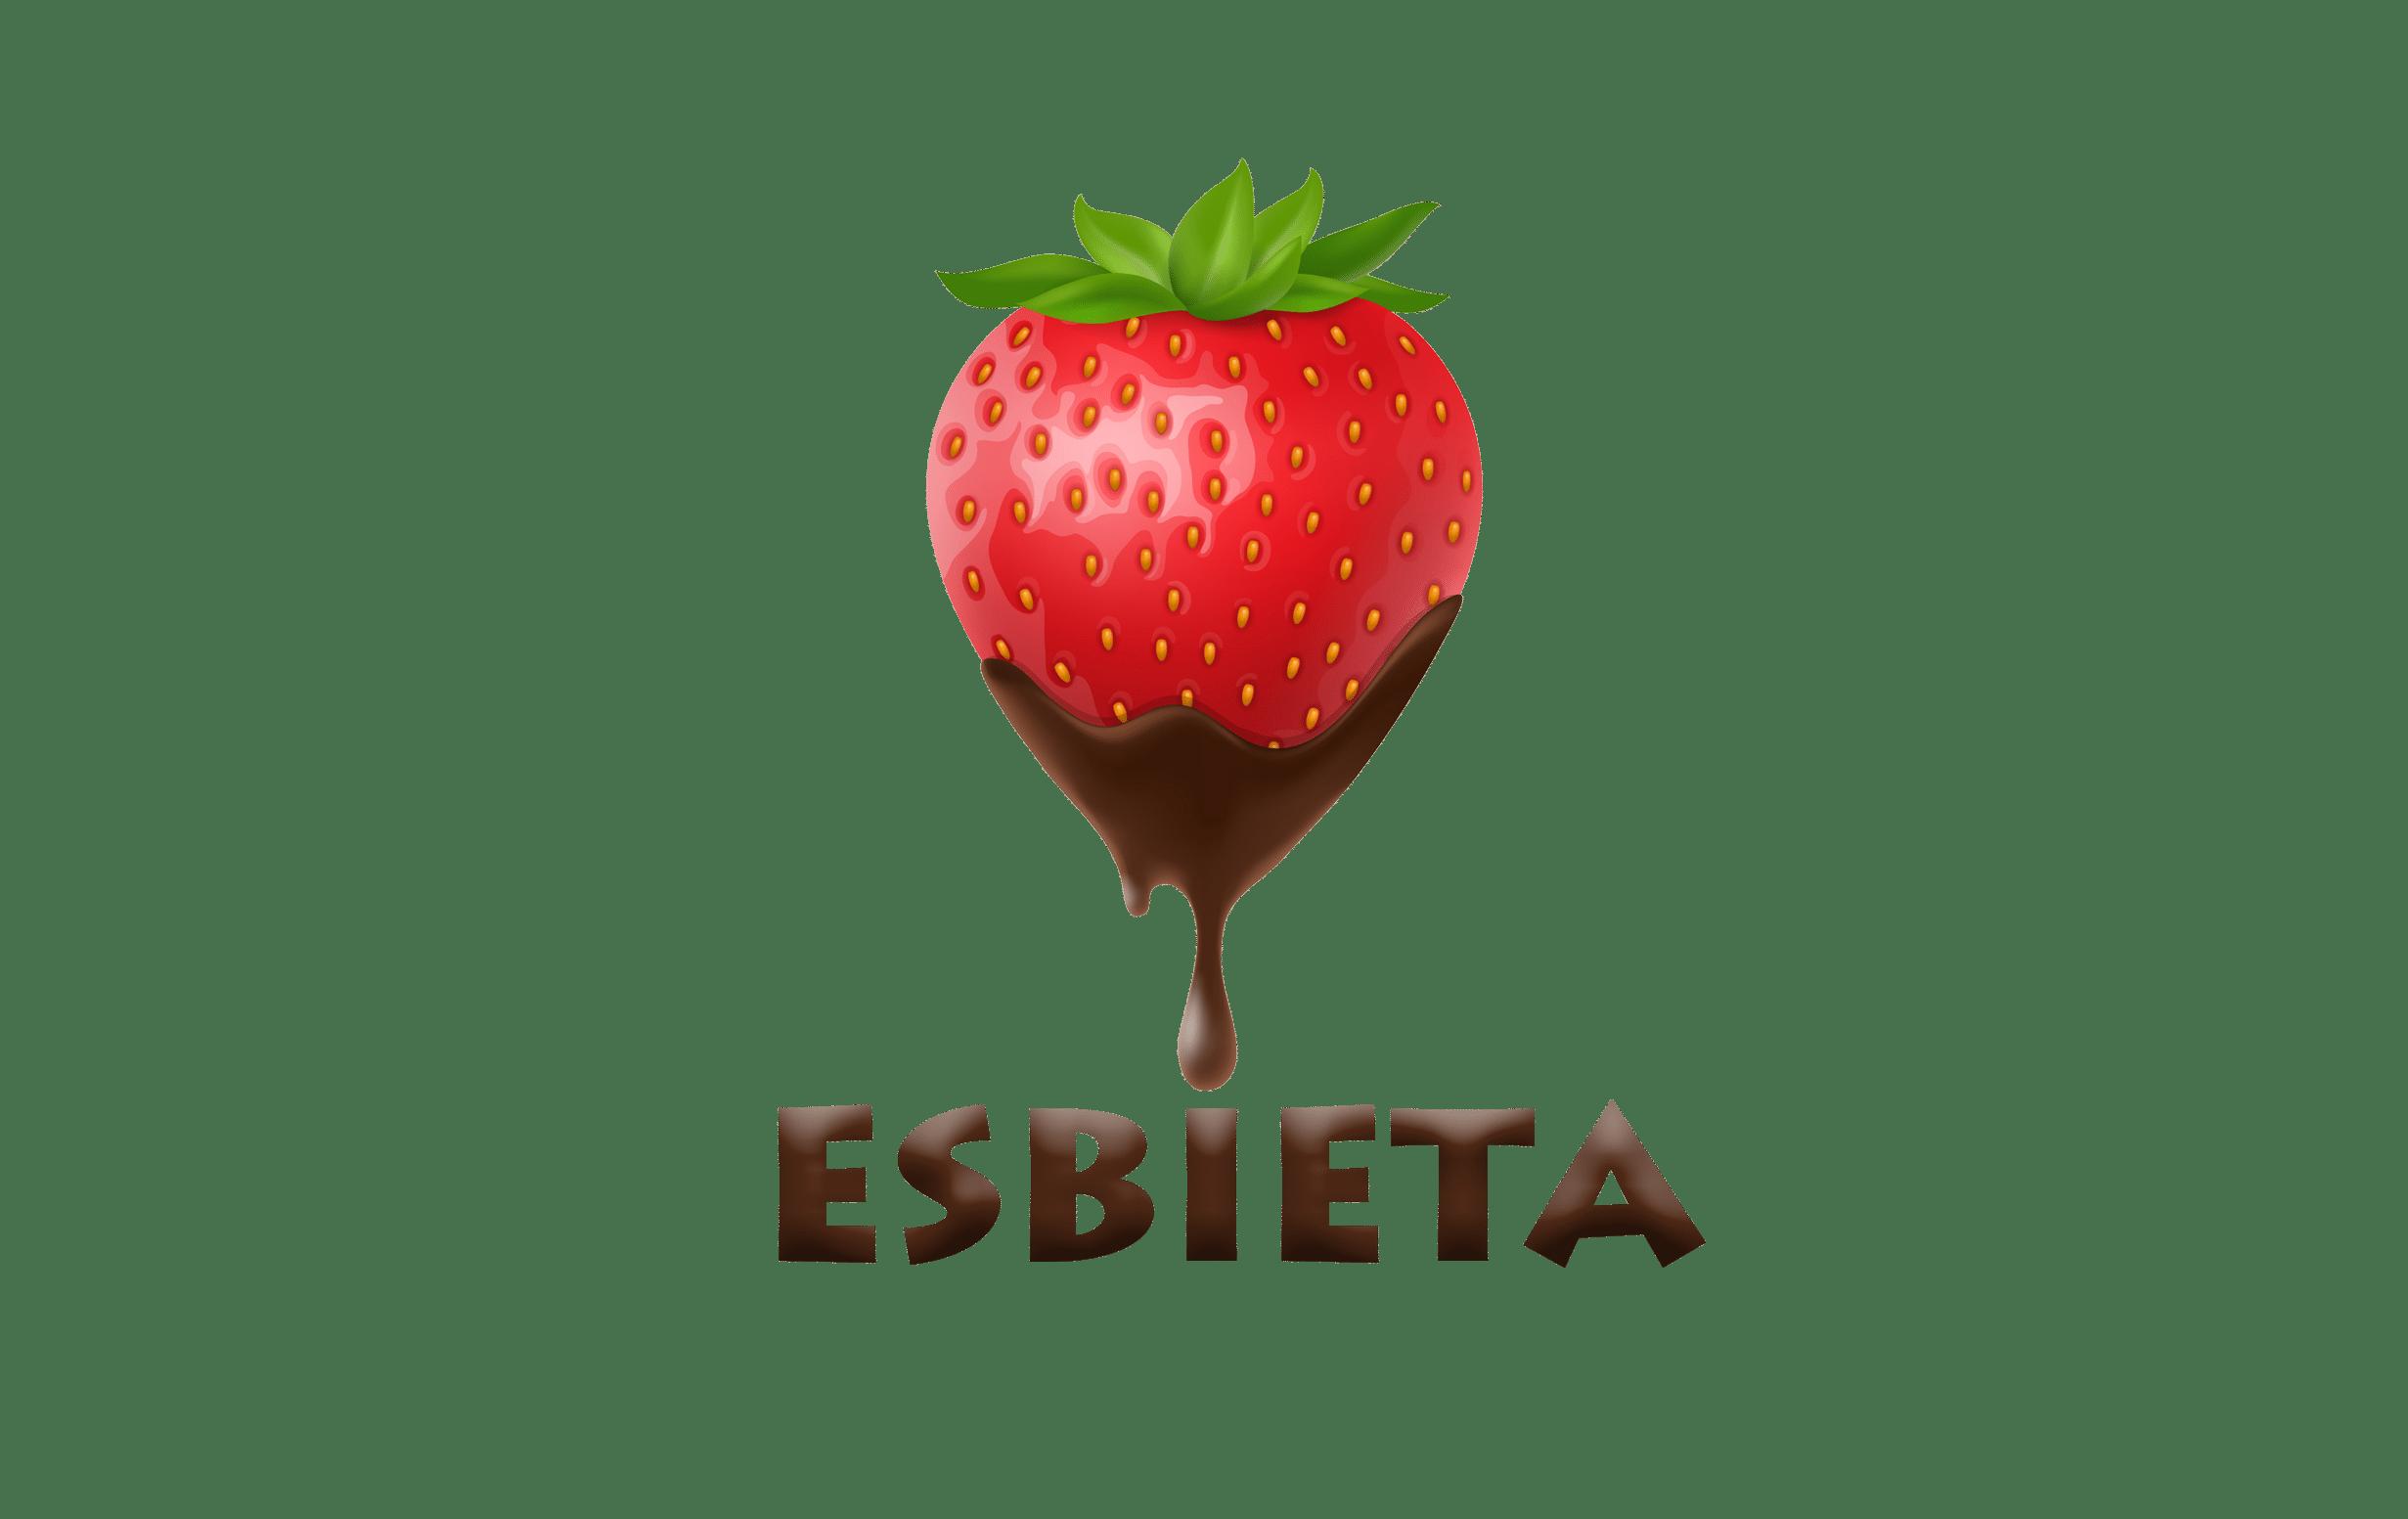 Recetas de Esbieta